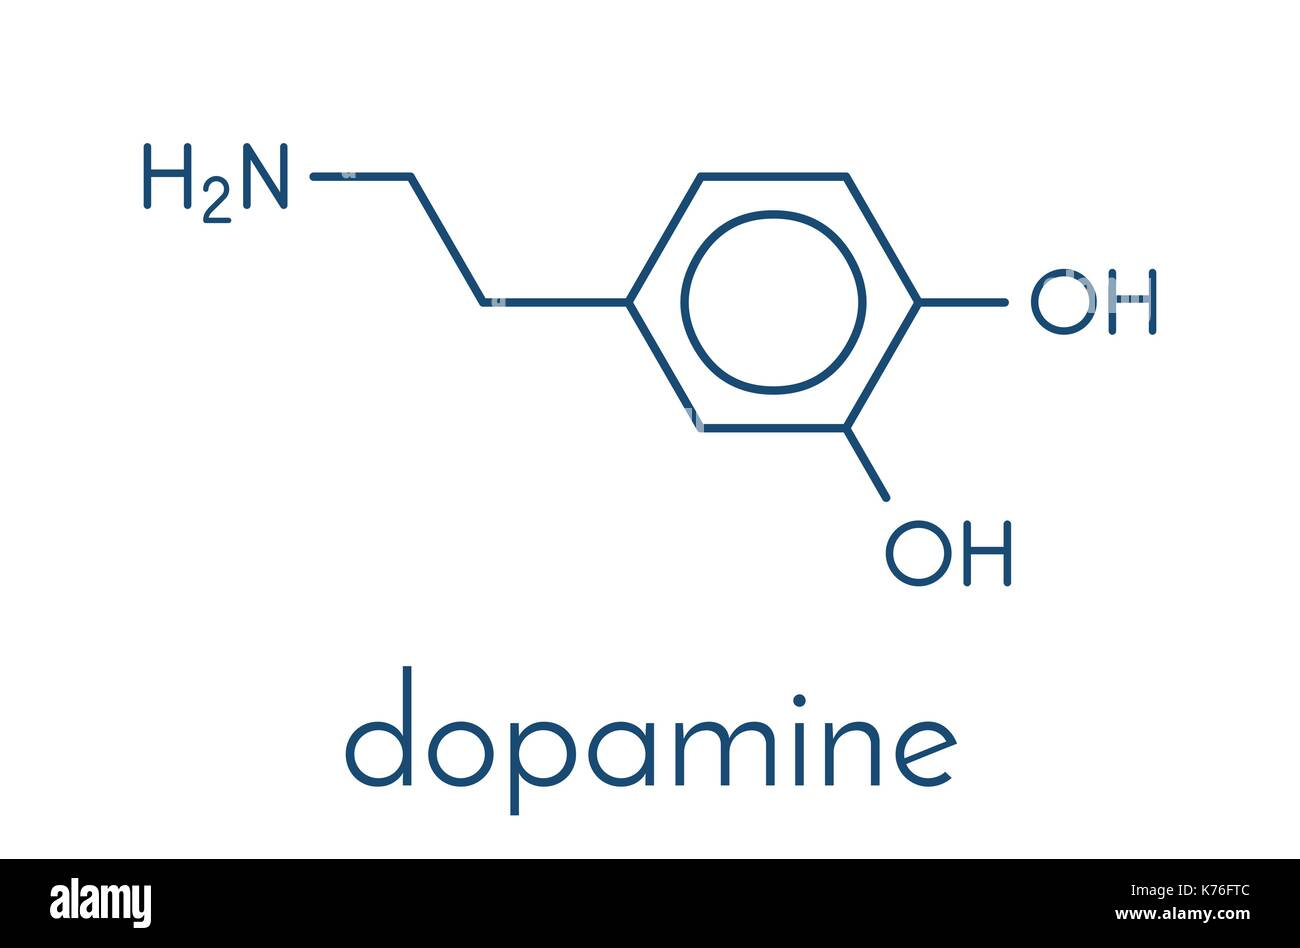 Dopamine Stock Photos & Dopamine Stock Images - Alamy